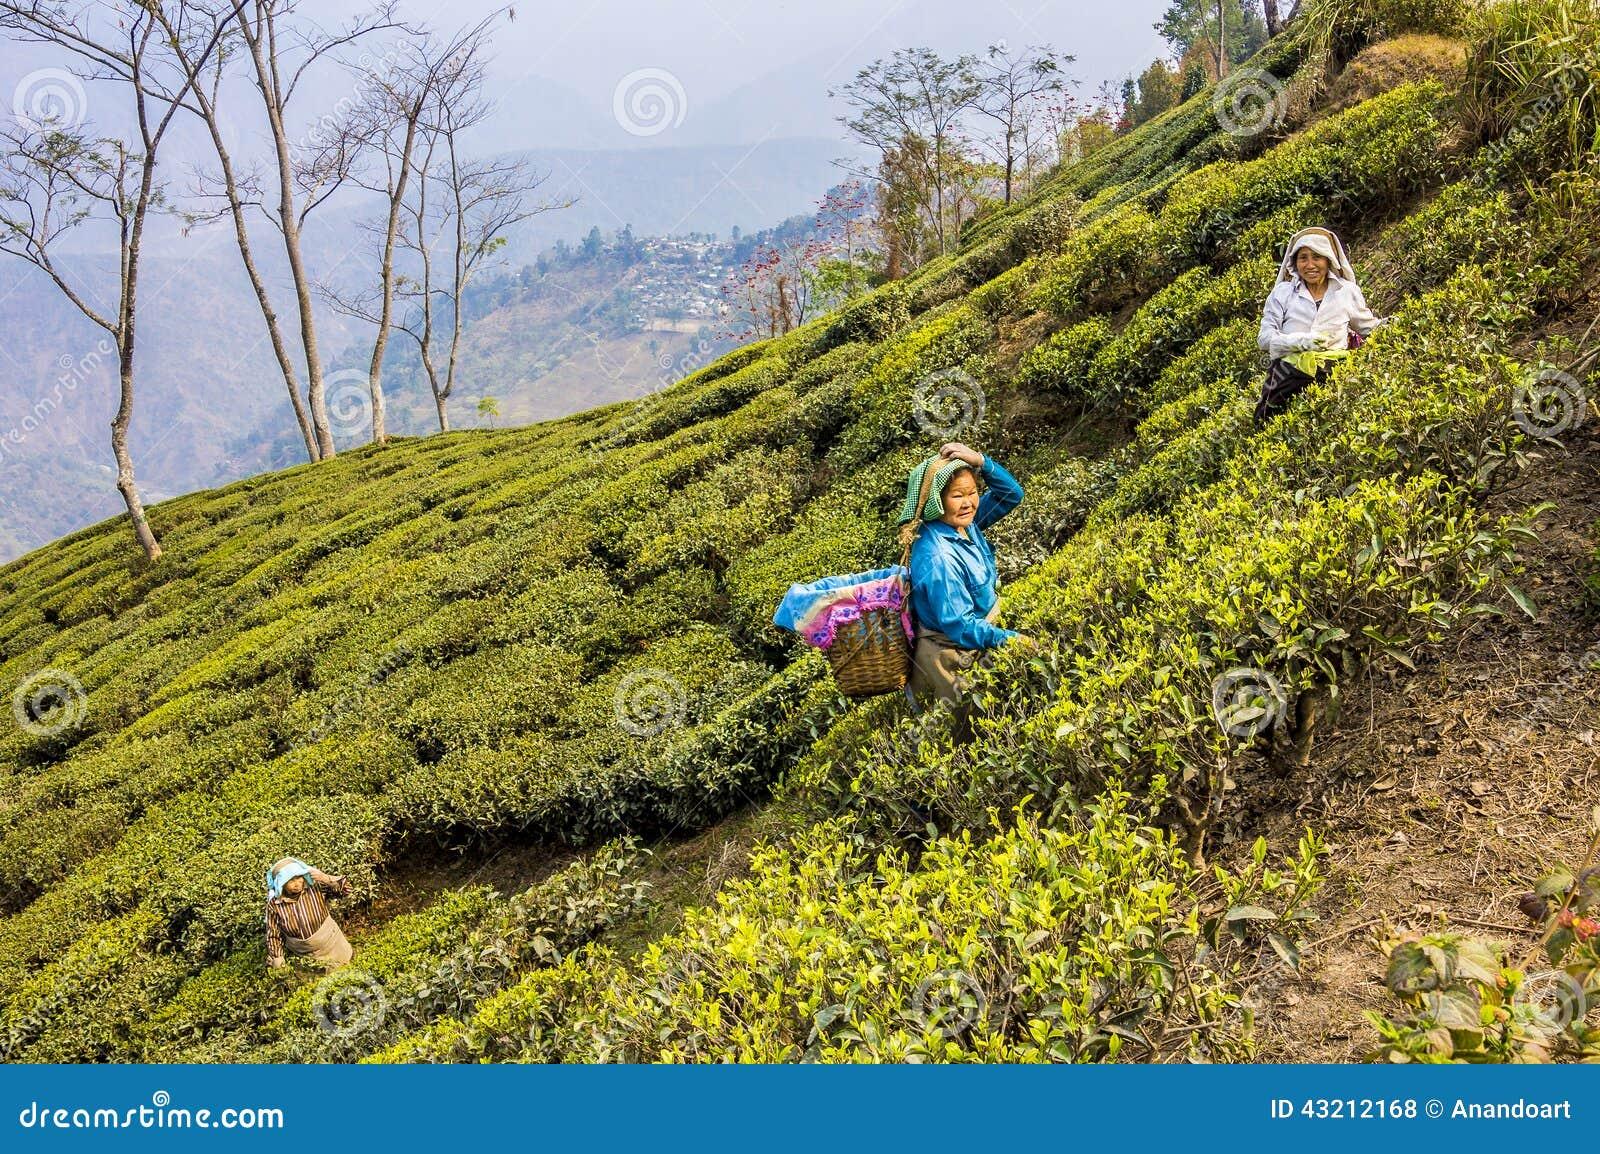 Tea pickers of darjeeling